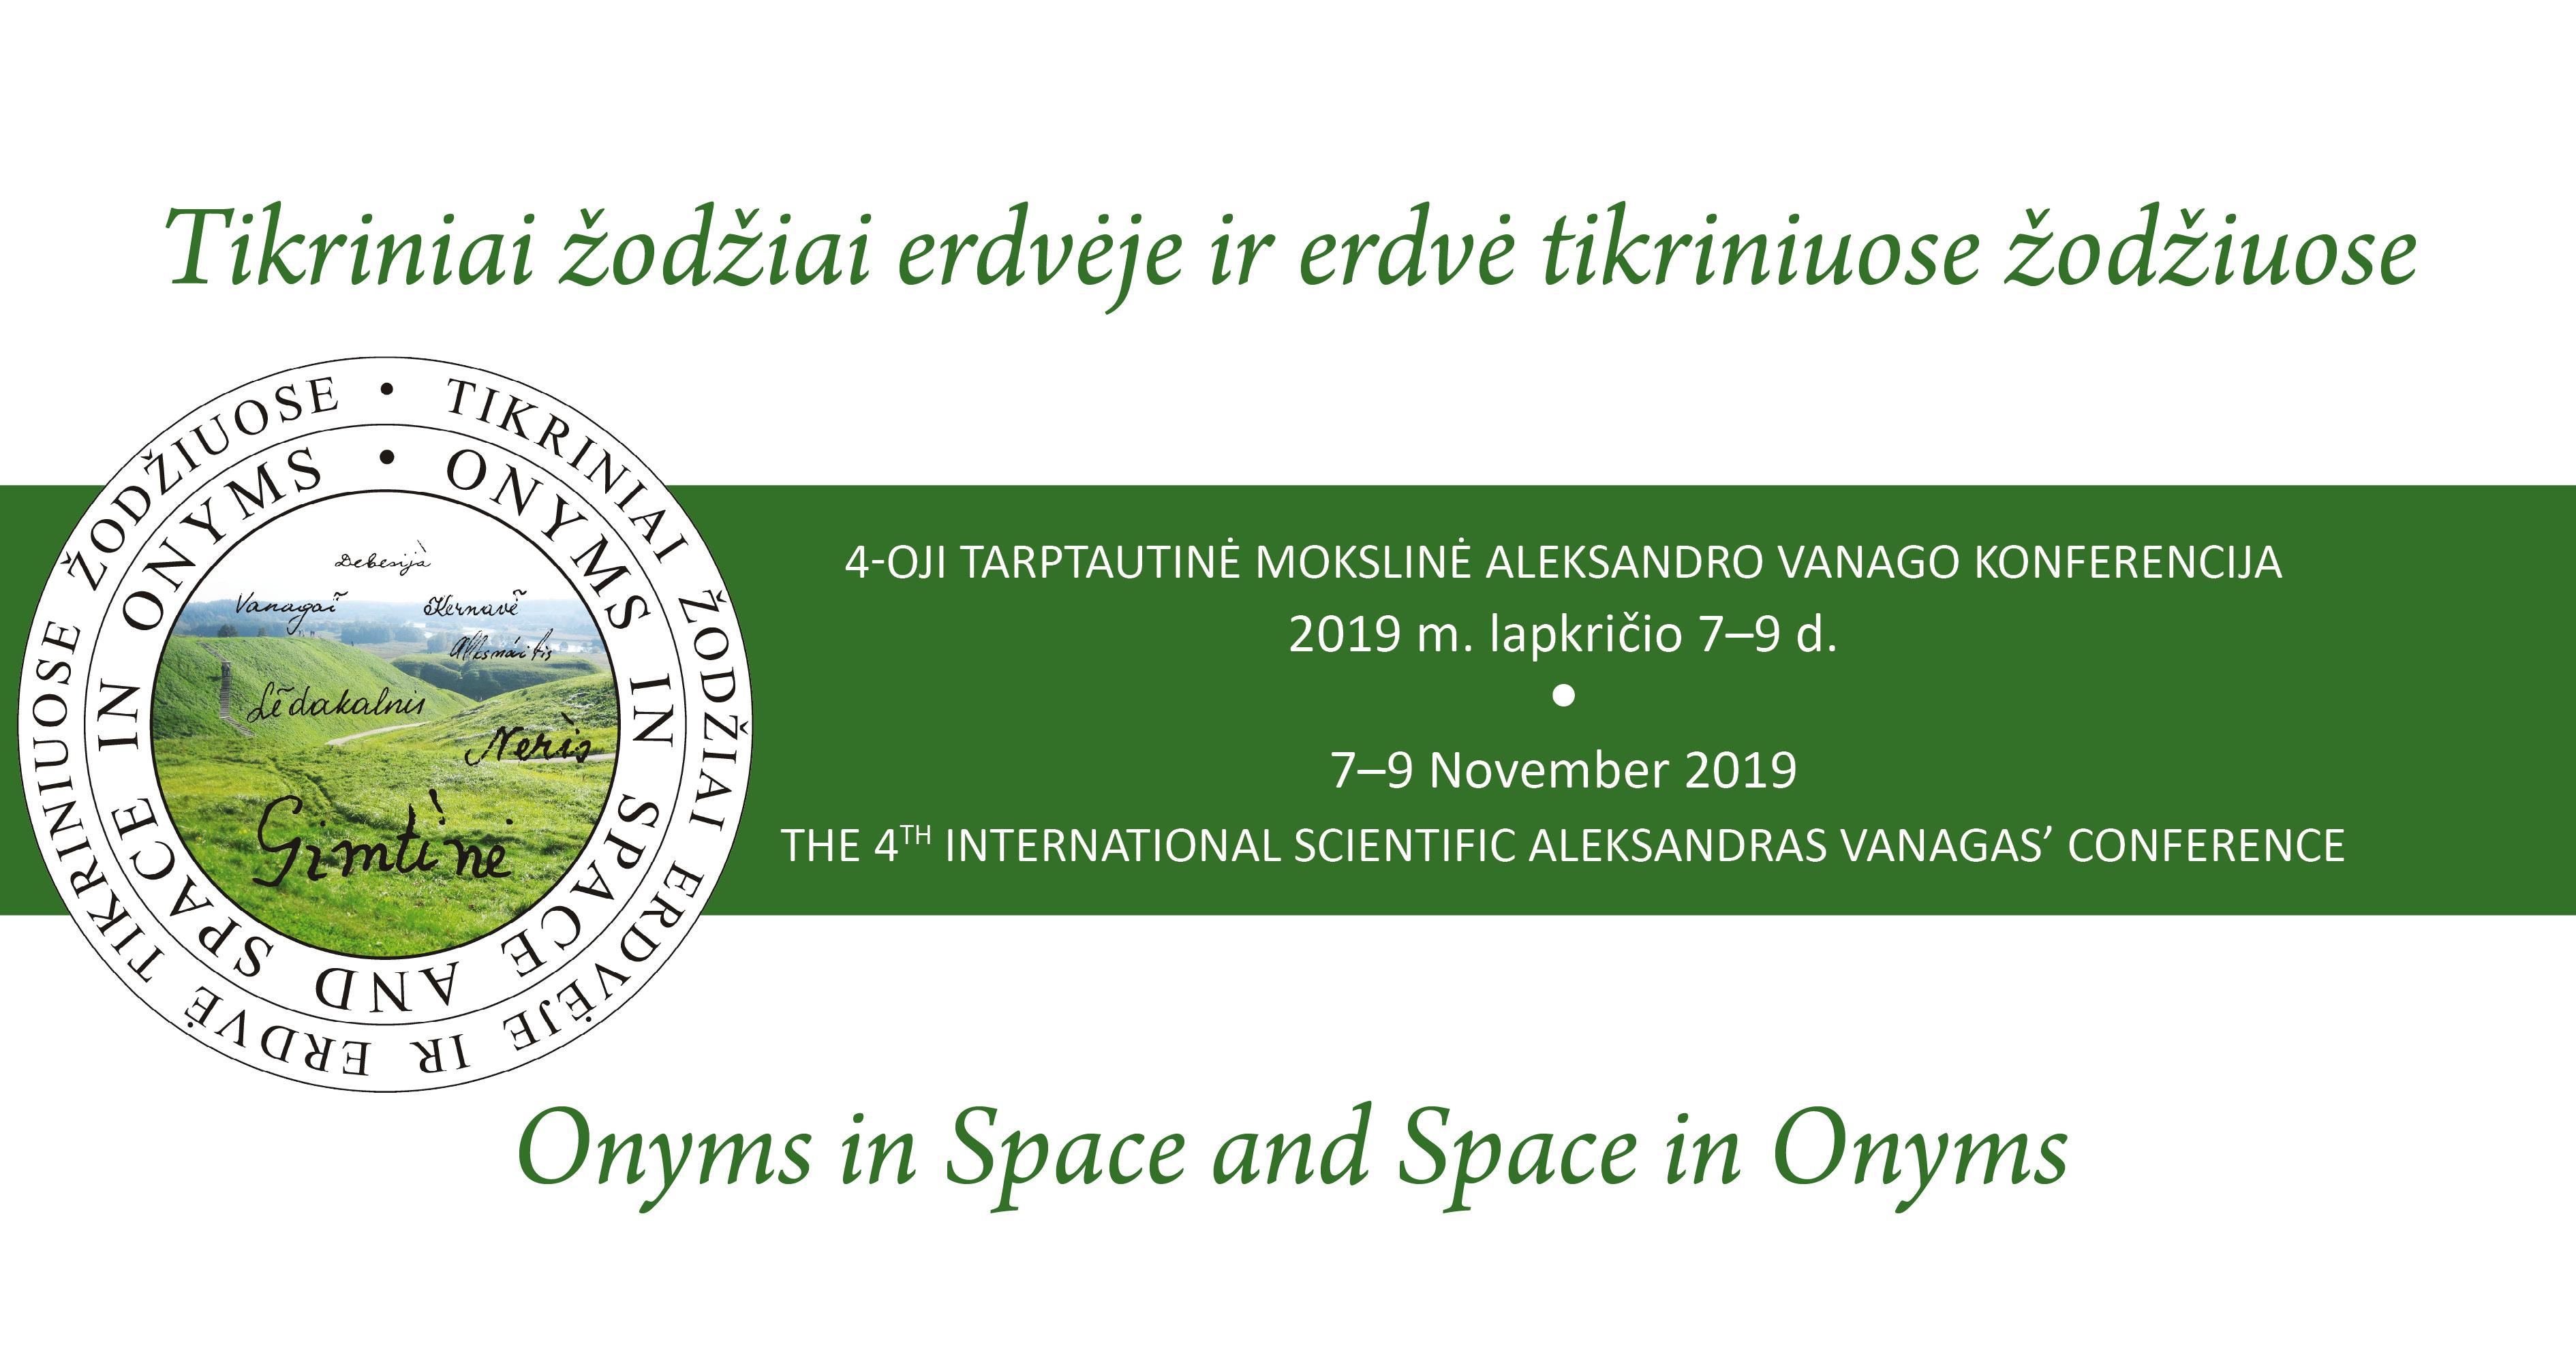 Vizualizacija-Vanago-konferencijai-1